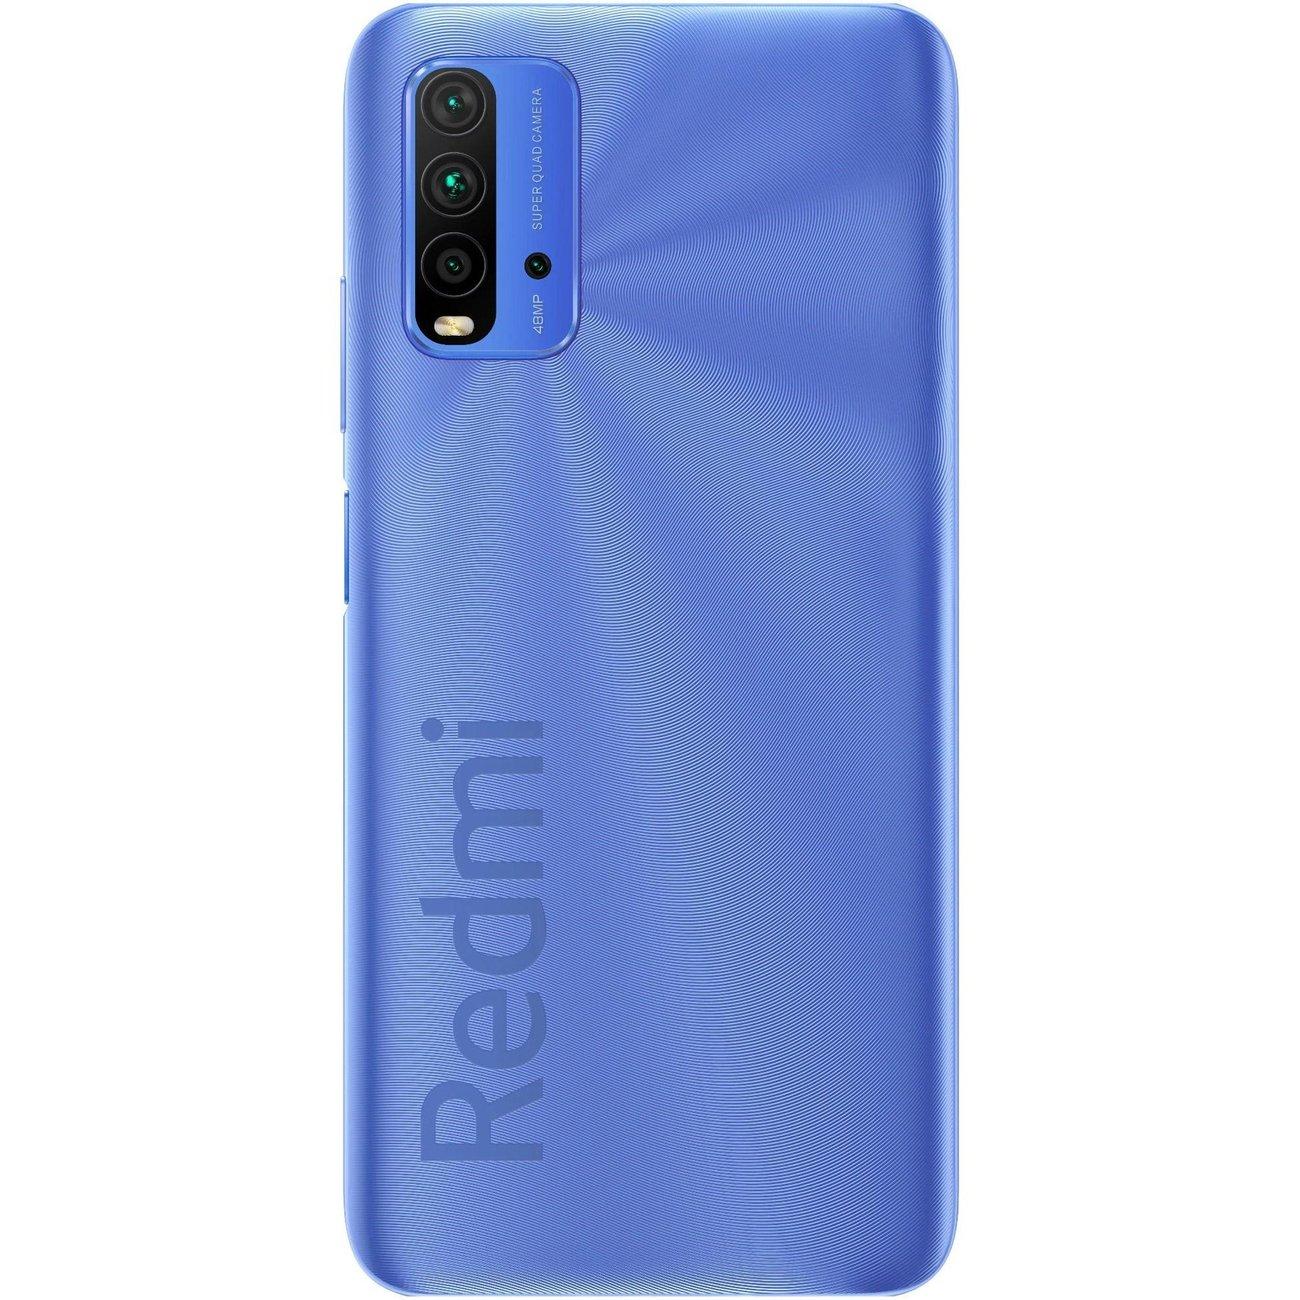 Смартфон Xiaomi REDMI 9T 128/4 DS TWILIGHT BLUE MZB08CGEU , 128 GB, 4 GB